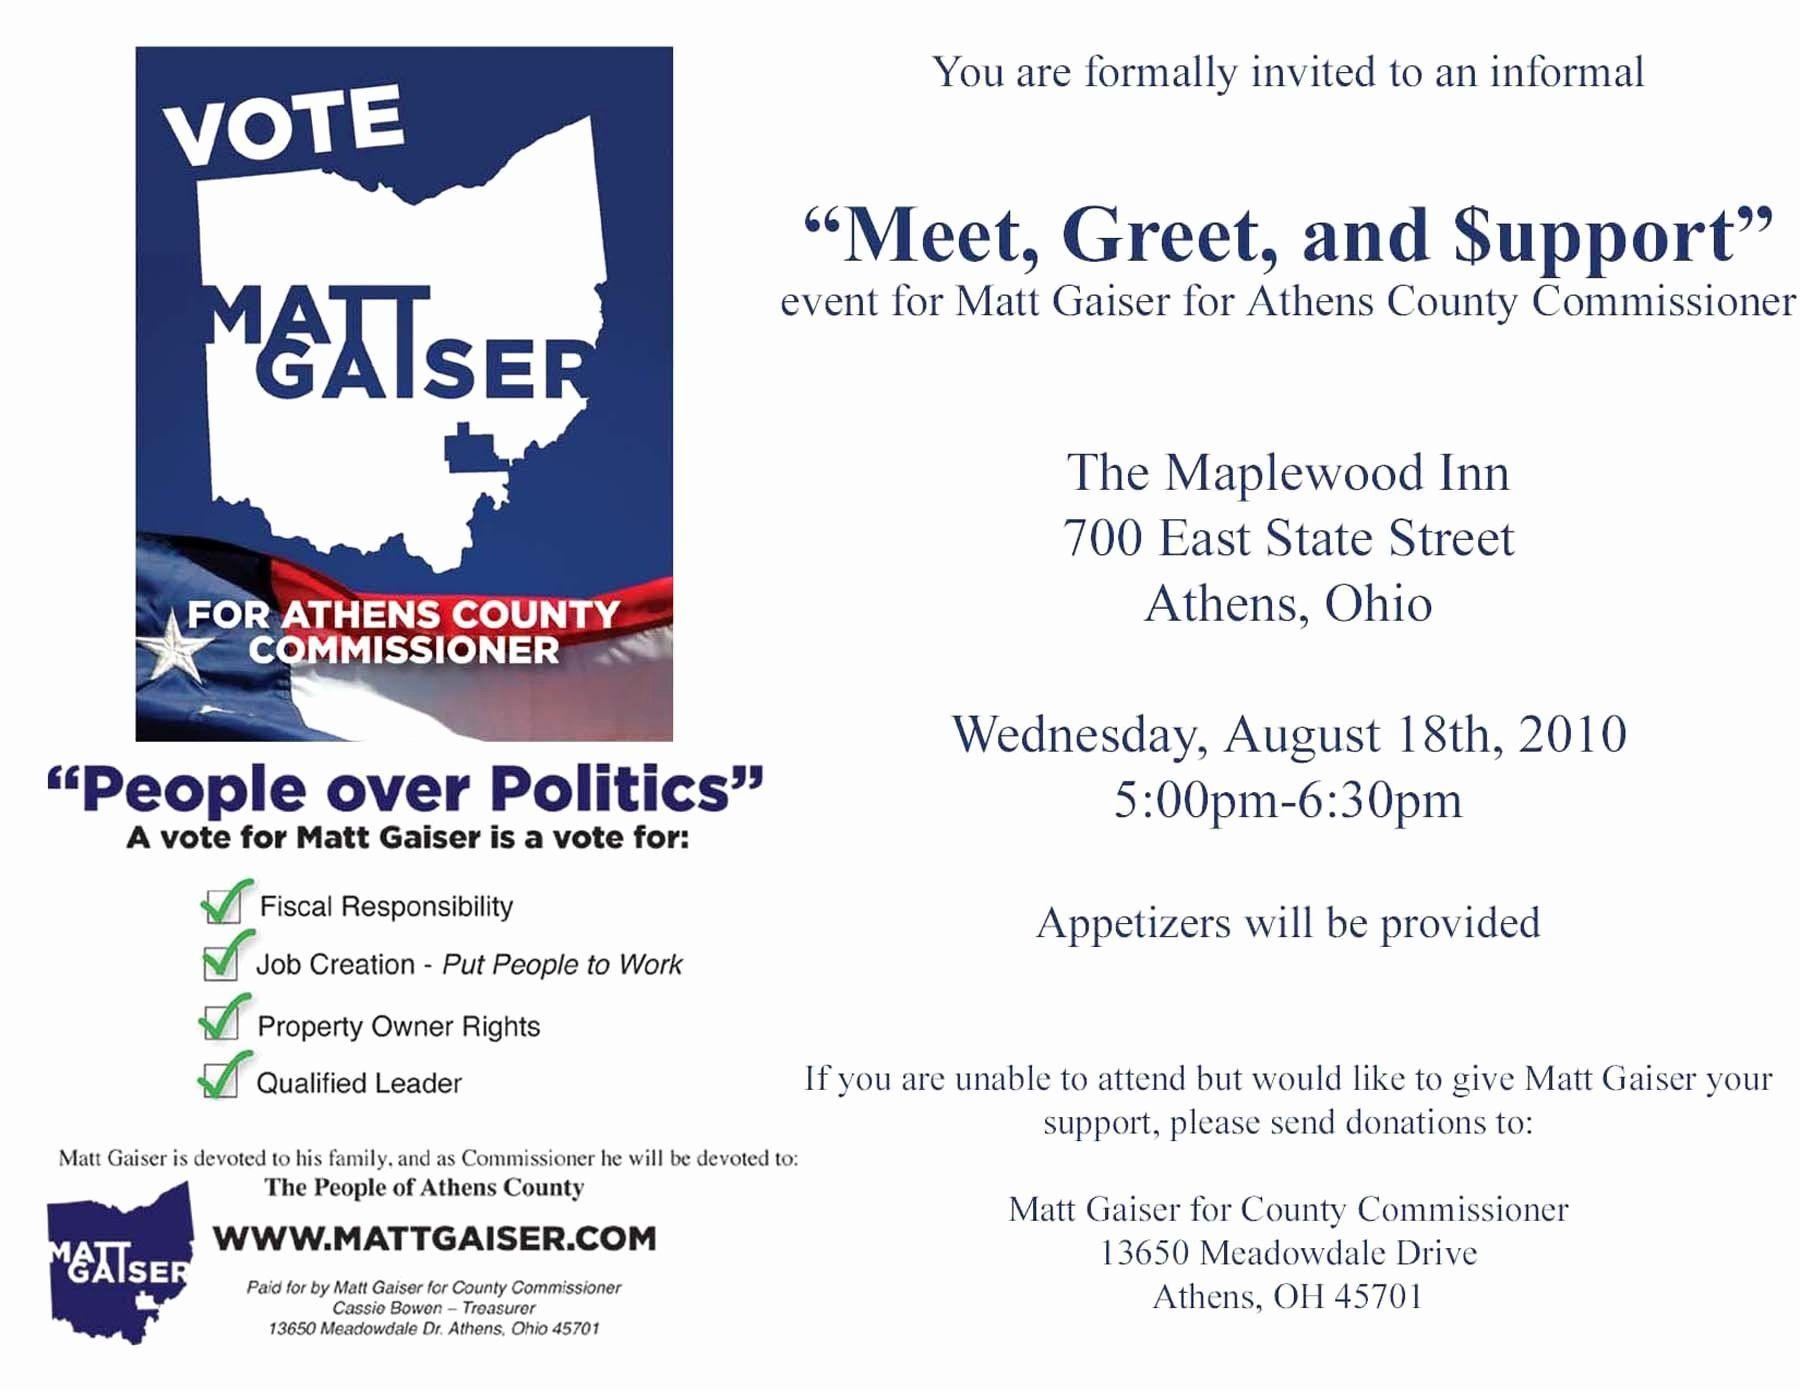 Meet and Greet Invitation Template Inspirational Political Fundraiser  Invita… in 2020 | Event invitation templates, Halloween party invitation  template, Invitation template